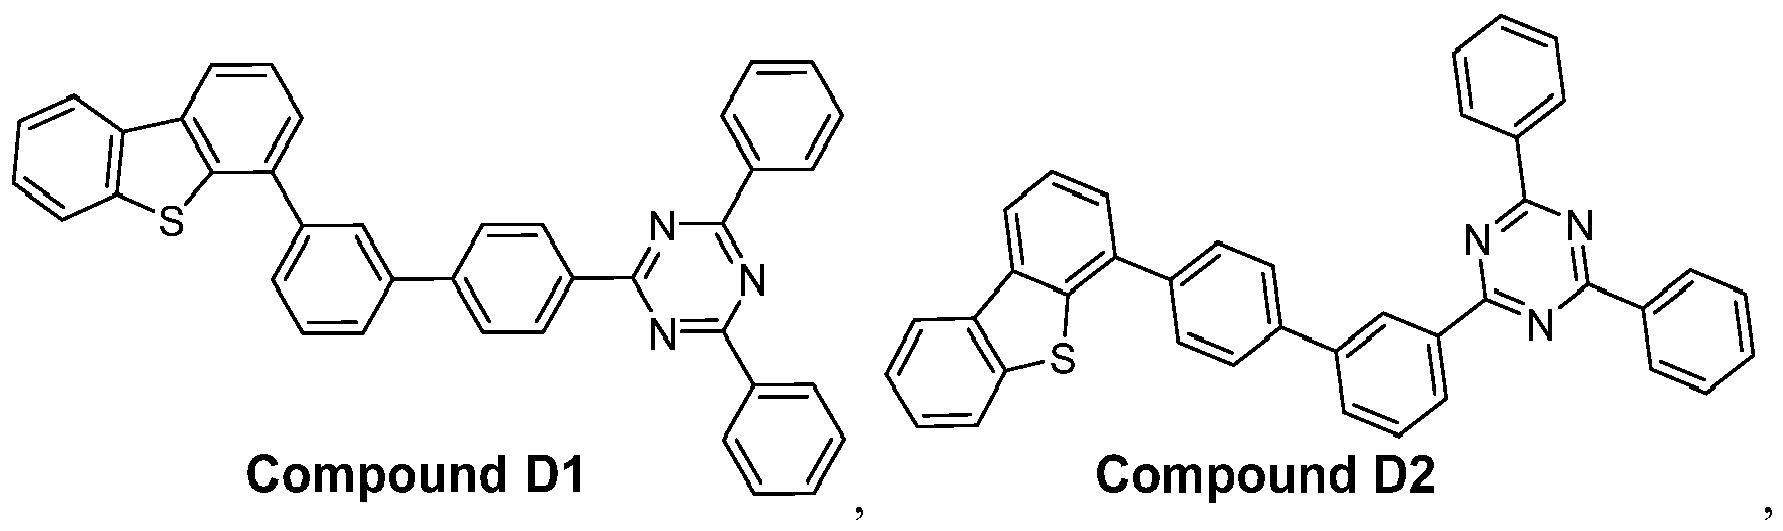 Figure imgb0637